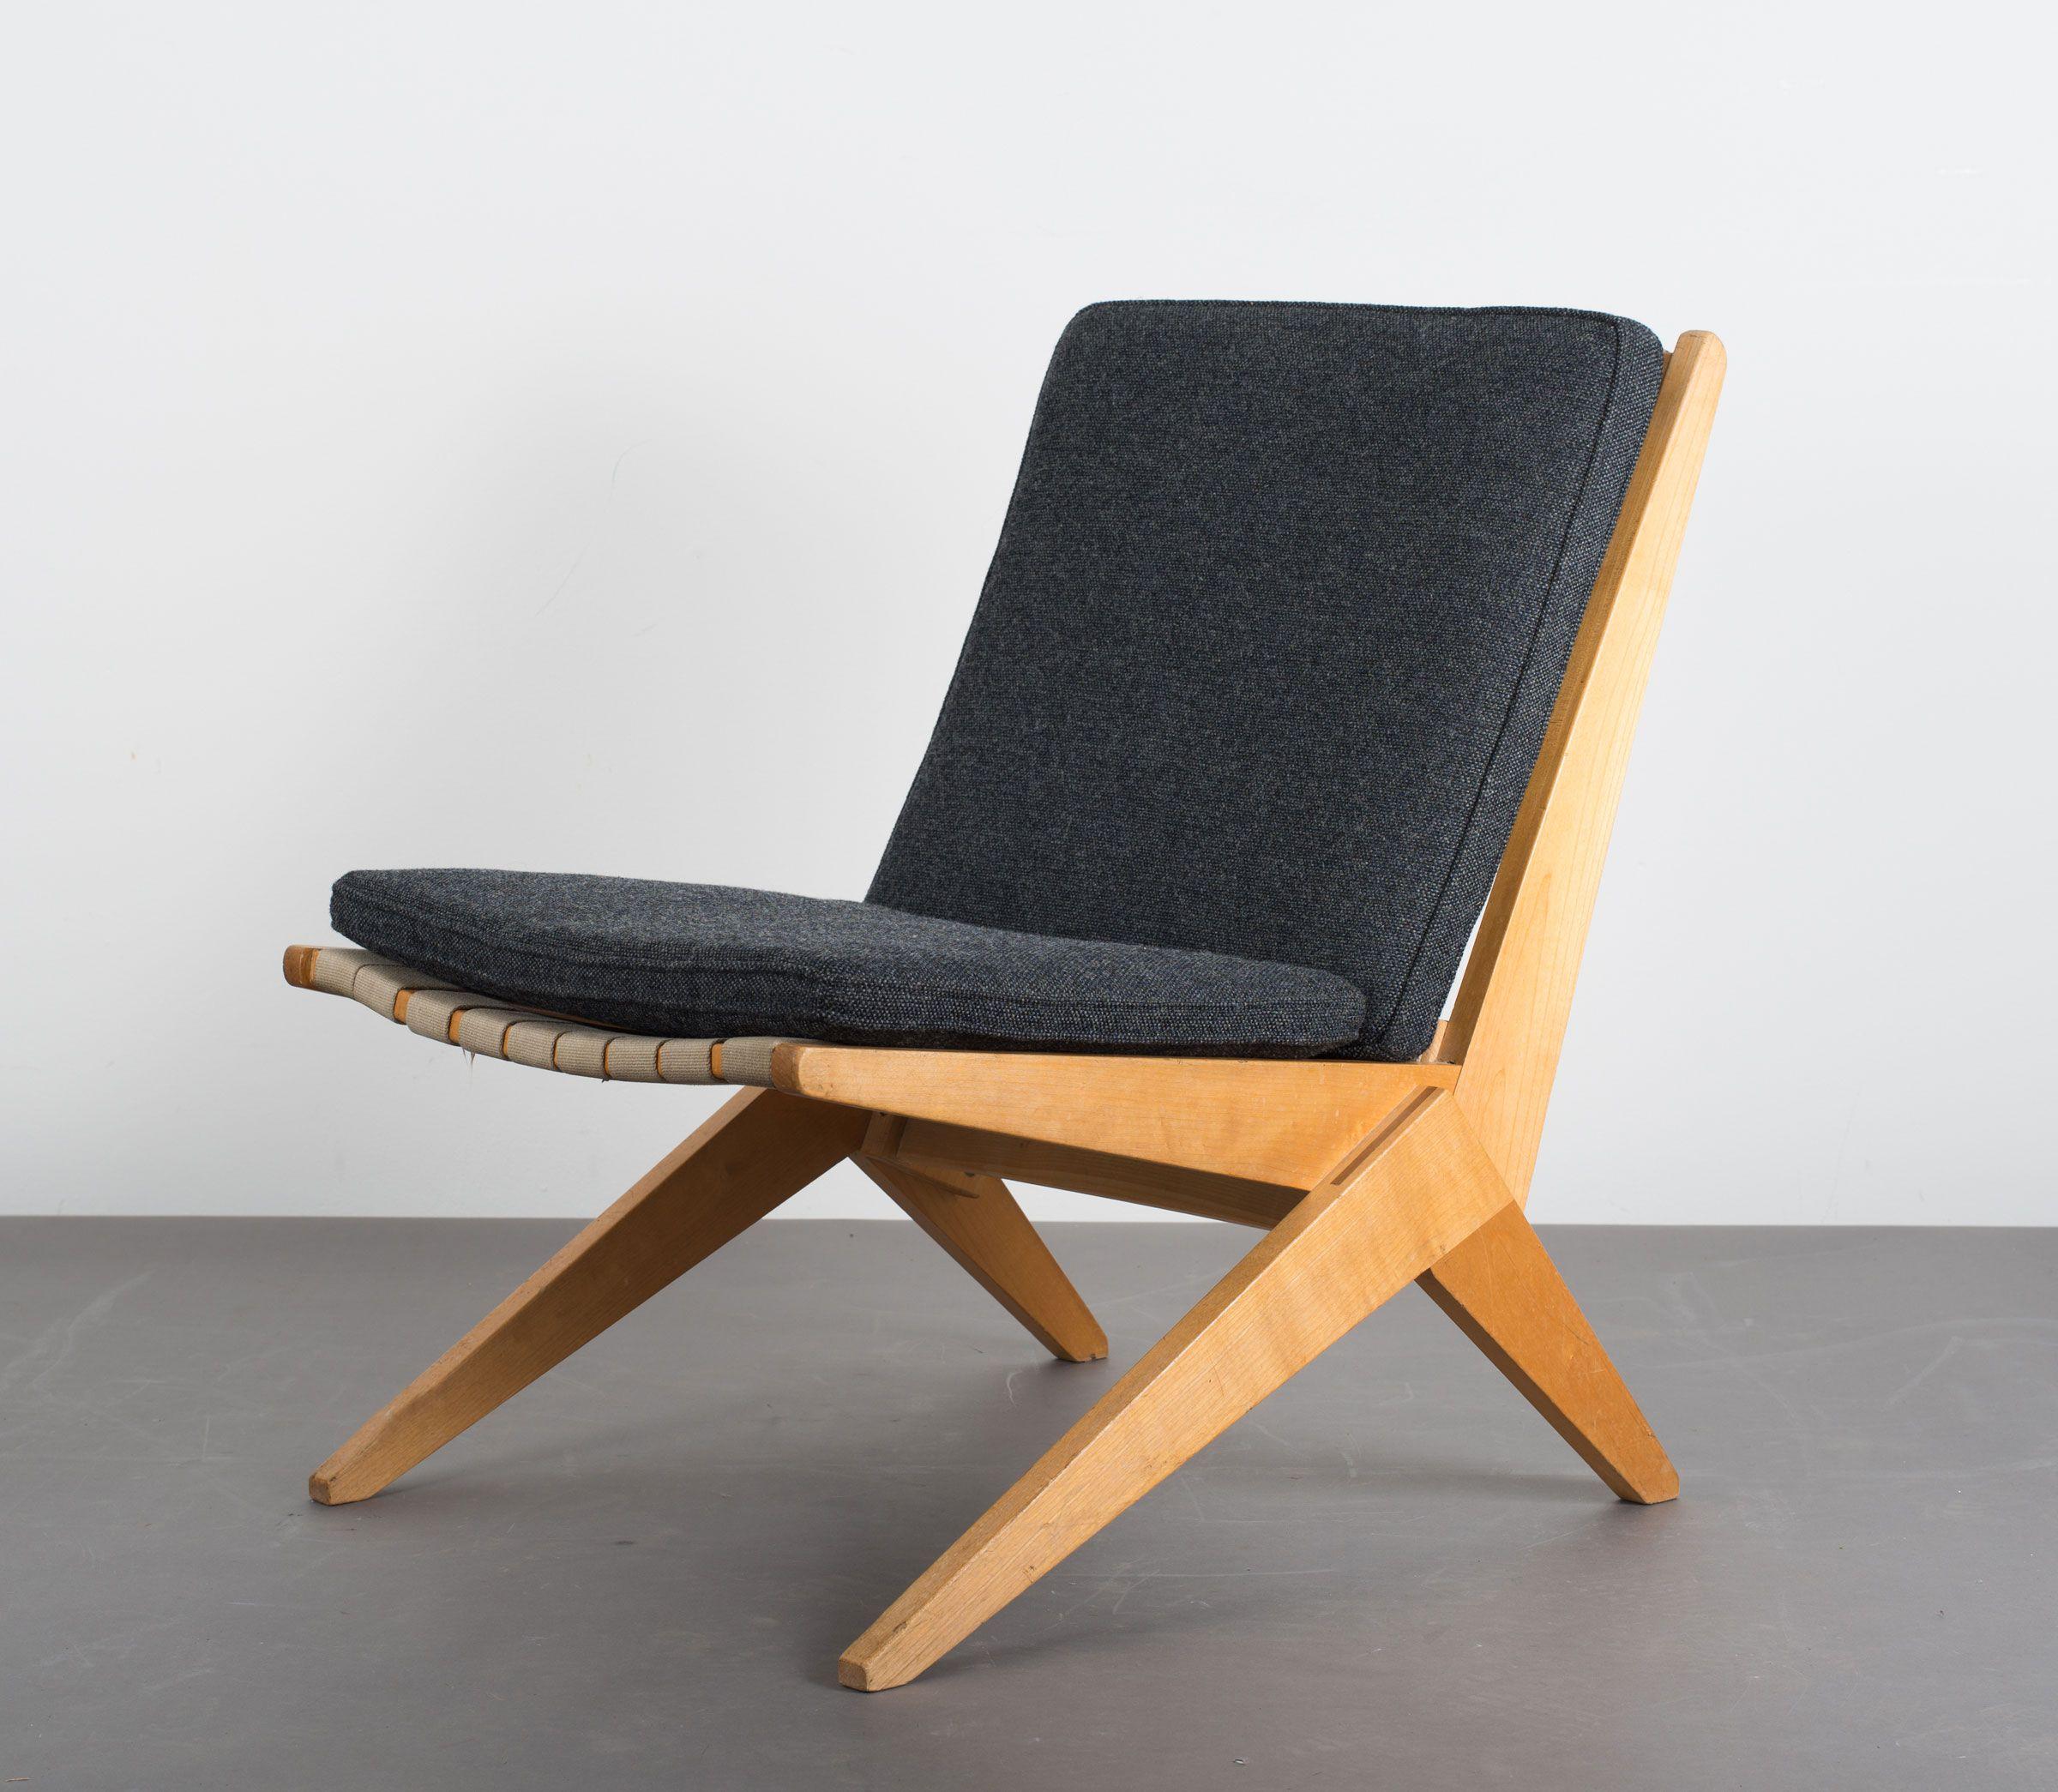 Architect Furniture Pierre Jeanneret Swiss Architect & Furniture Designer 1896